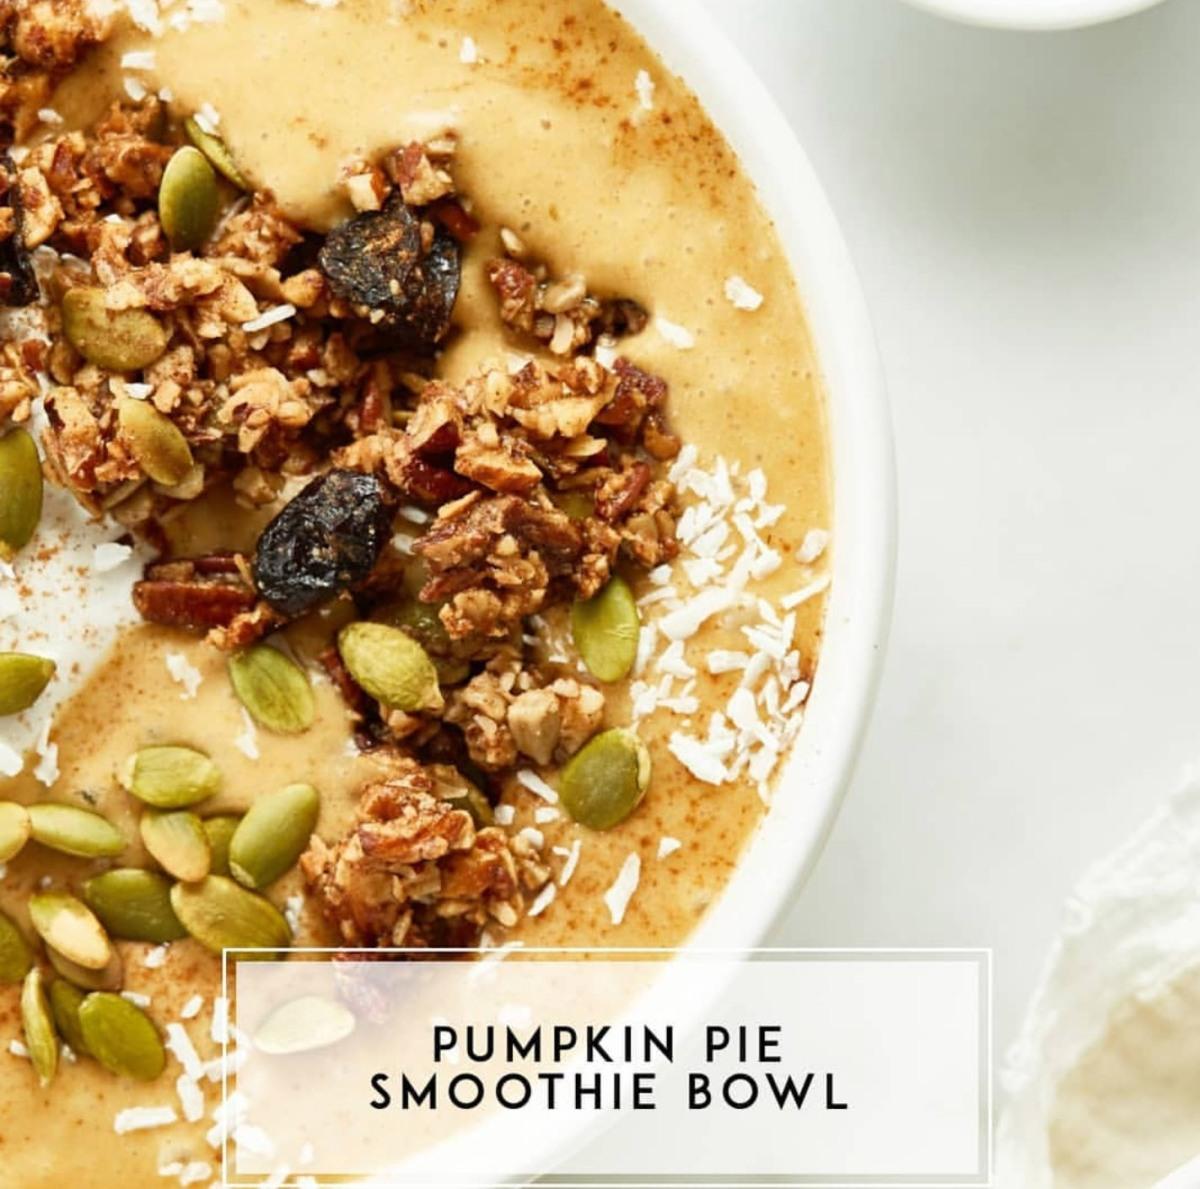 Vegan Pumpkin Pie Smoothie Bowl